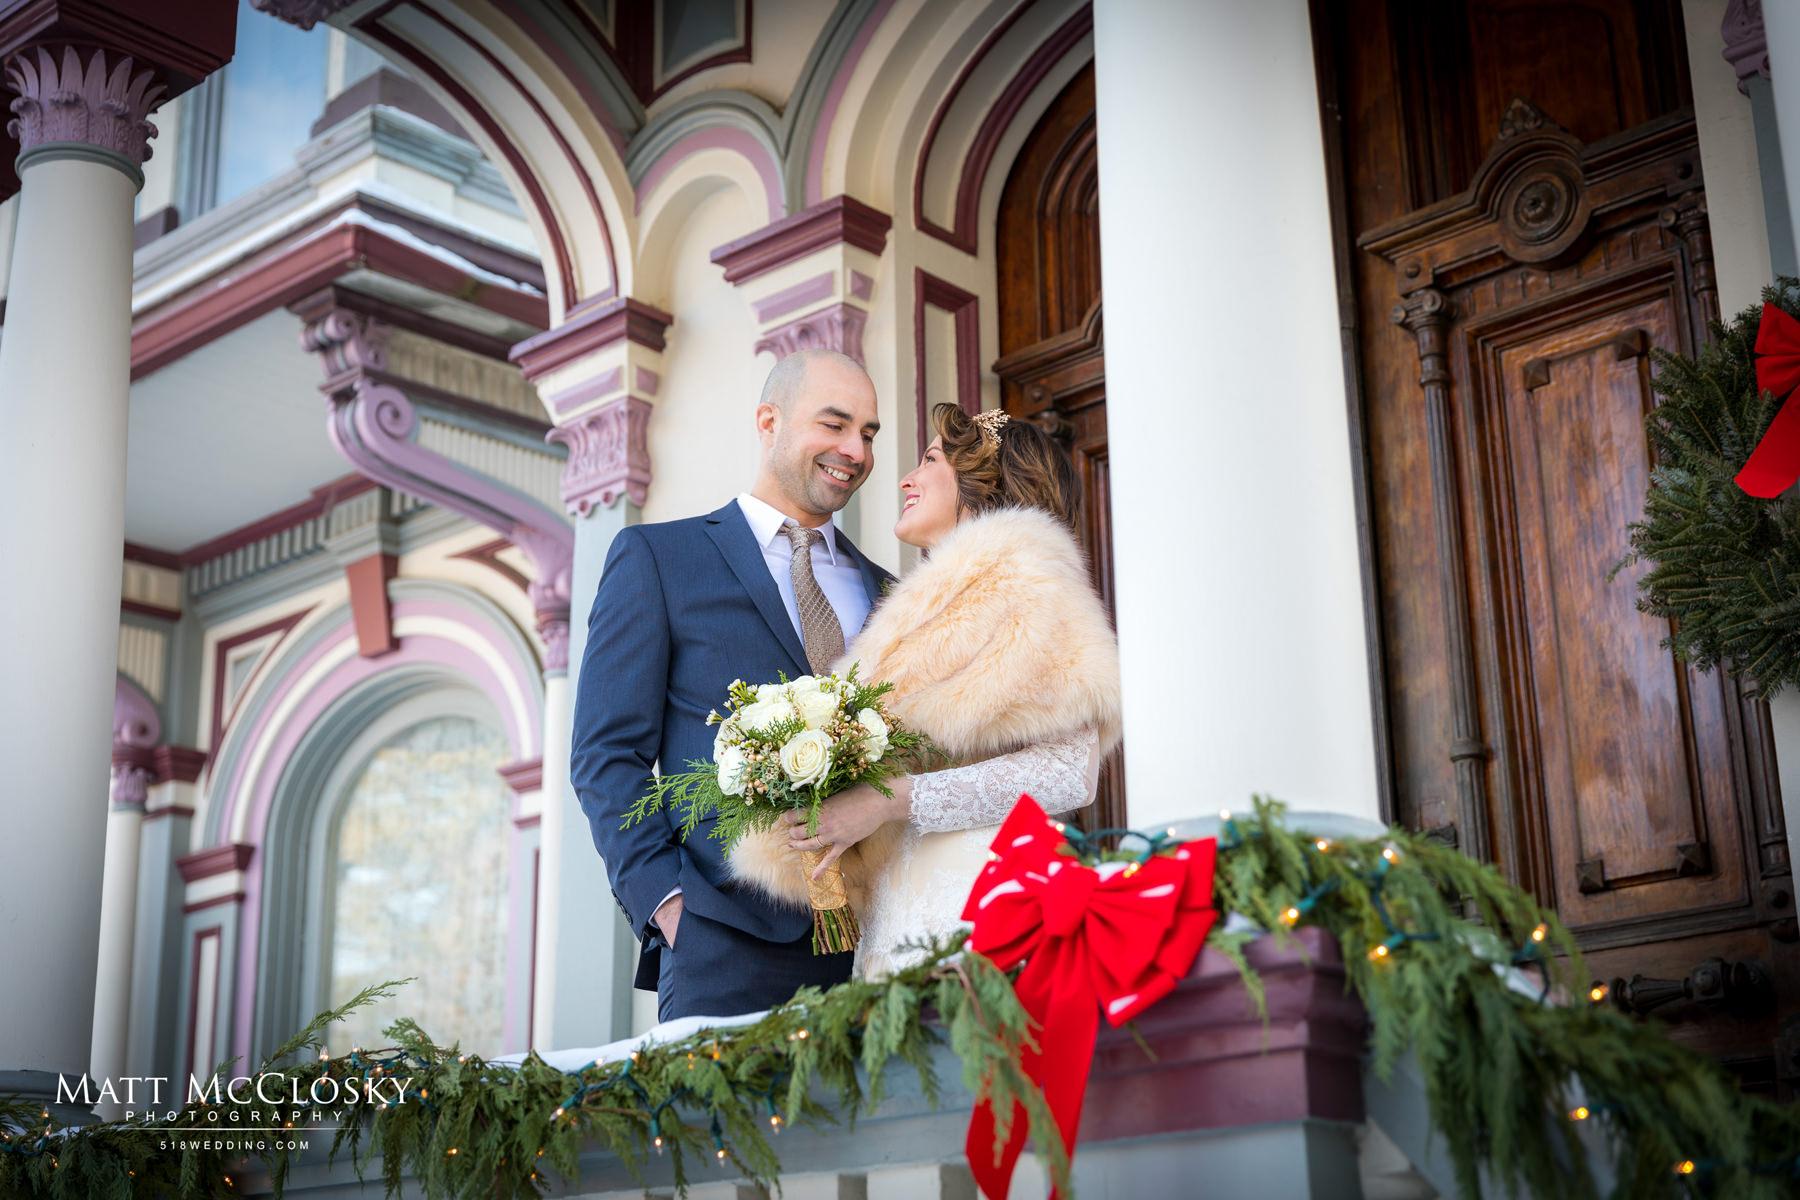 Nina and Jon Batcheller Mansion Inn Wedding Photos Saratoga Springs NY Matt McClosky Photography 518Wedding 518Photo Wedding photographer Albany NY Reverend Joy Burke